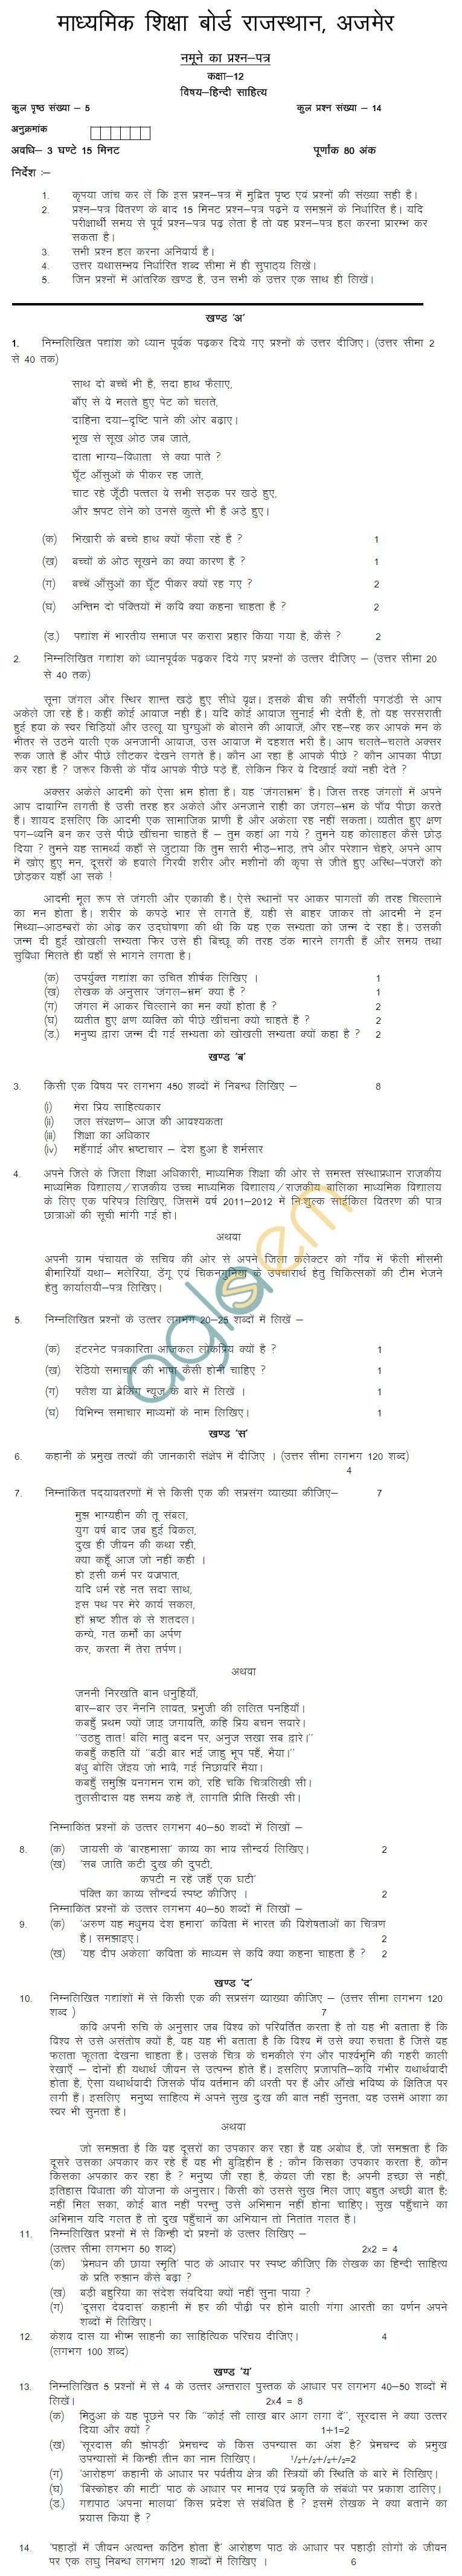 Rajasthan Board Class 12 Hindi Sahitya Model Question Paper